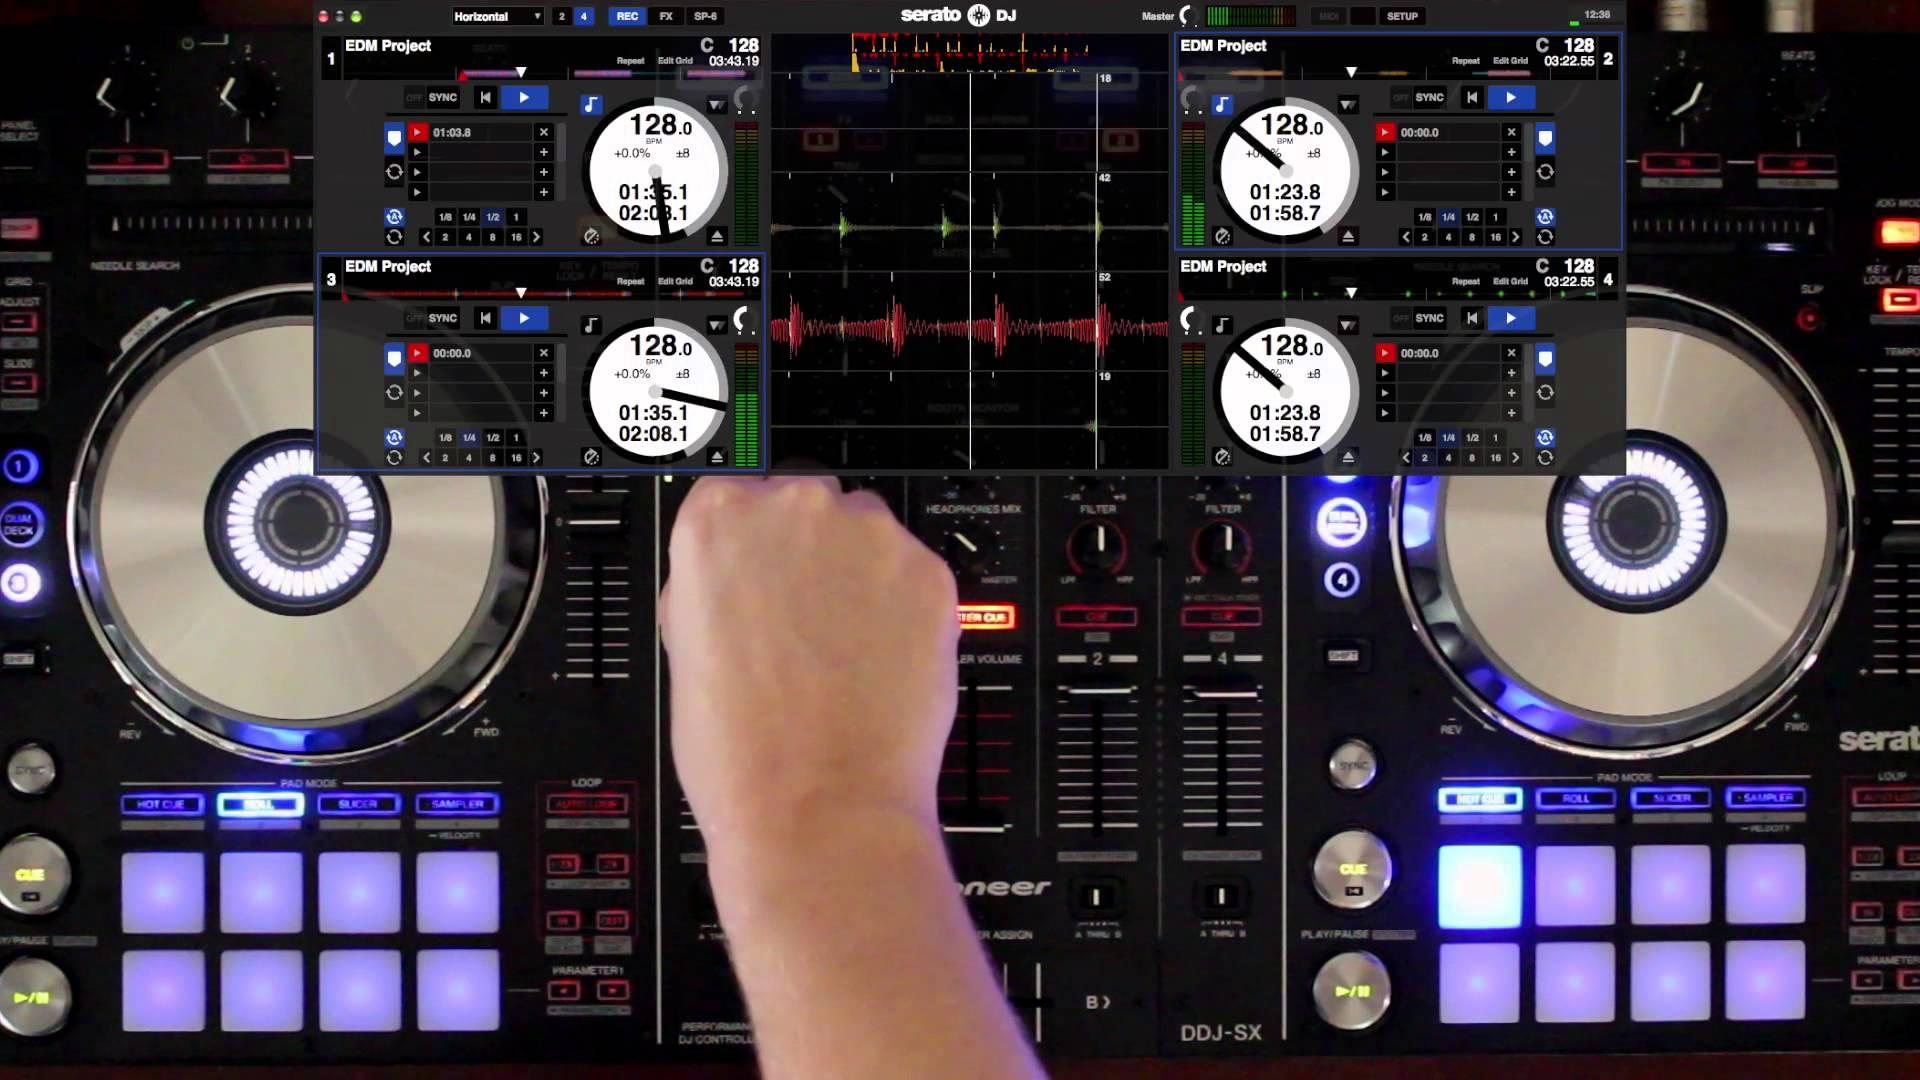 Manage Mixing Deck Serato DJ